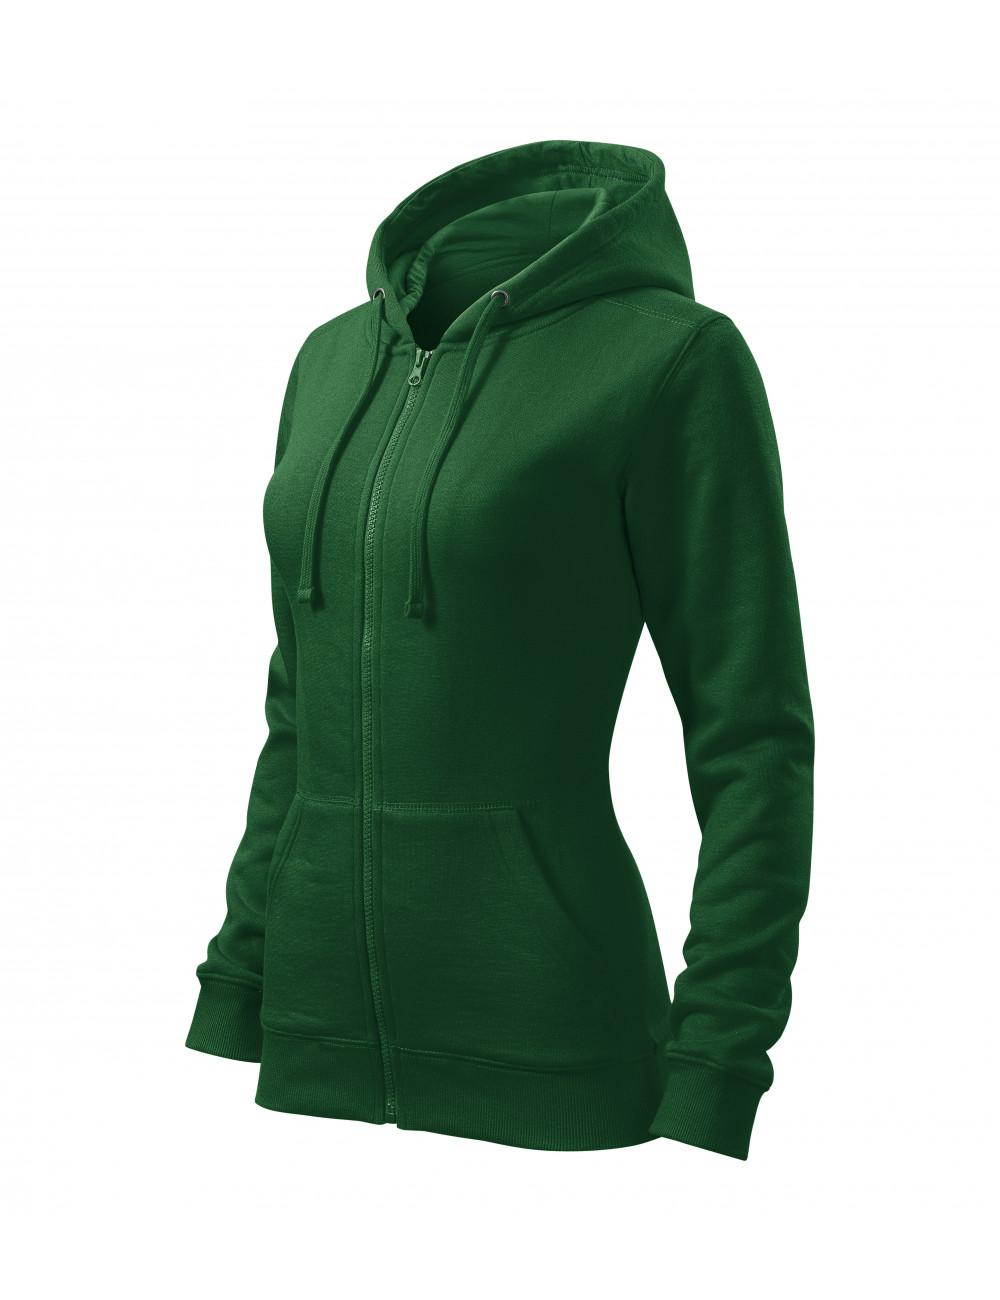 Adler MALFINI Bluza damska Trendy Zipper 411 zieleń butelkowa